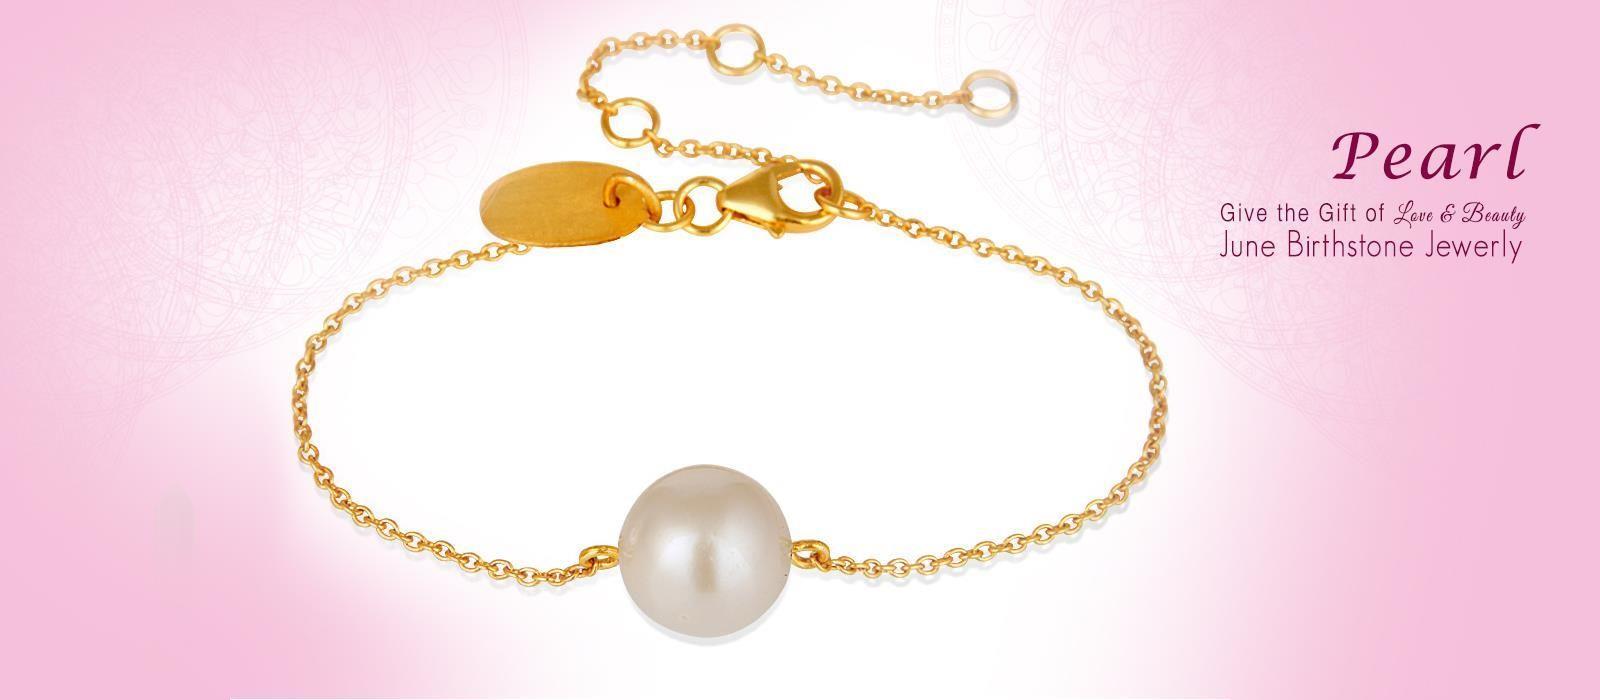 June Birthstone Pearl Jewelry Manufacturer